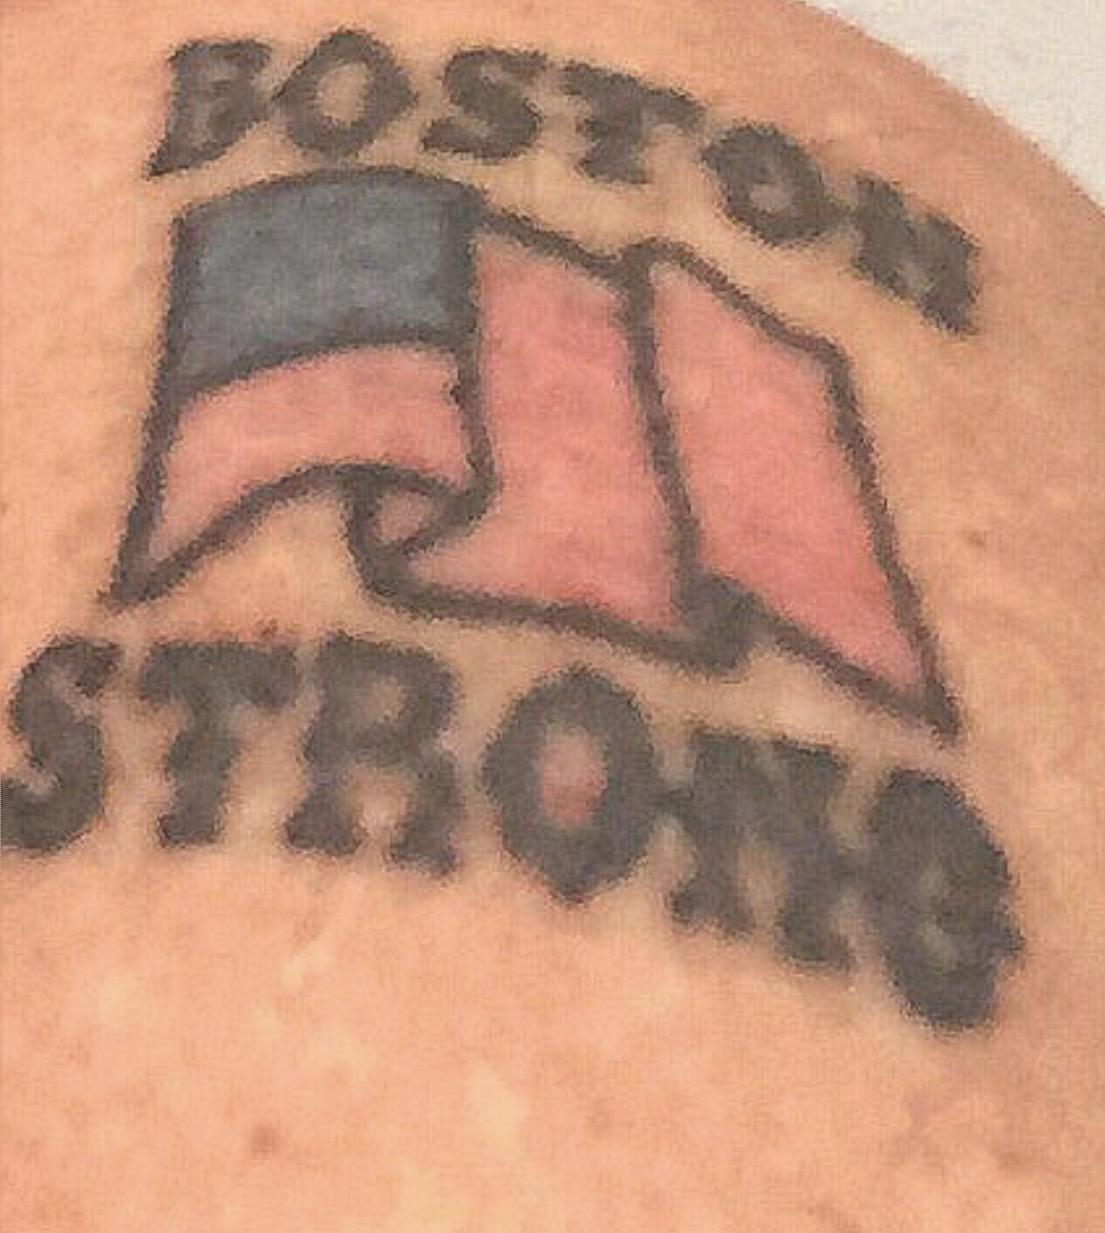 Boston Marathon Memorial Tattoo